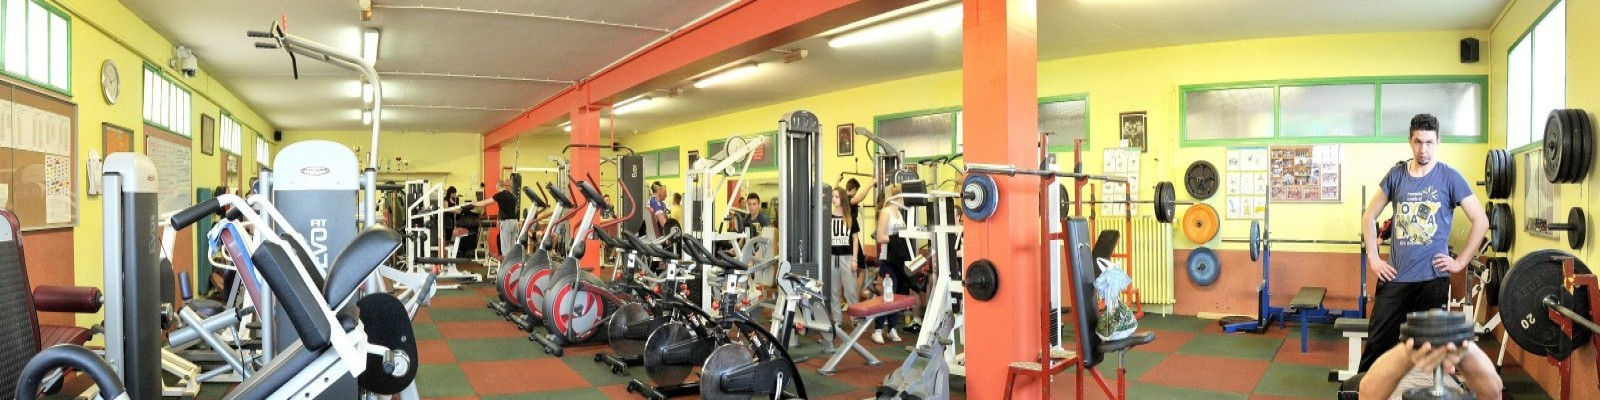 SAV Halterophilie Verdun musculation fitness